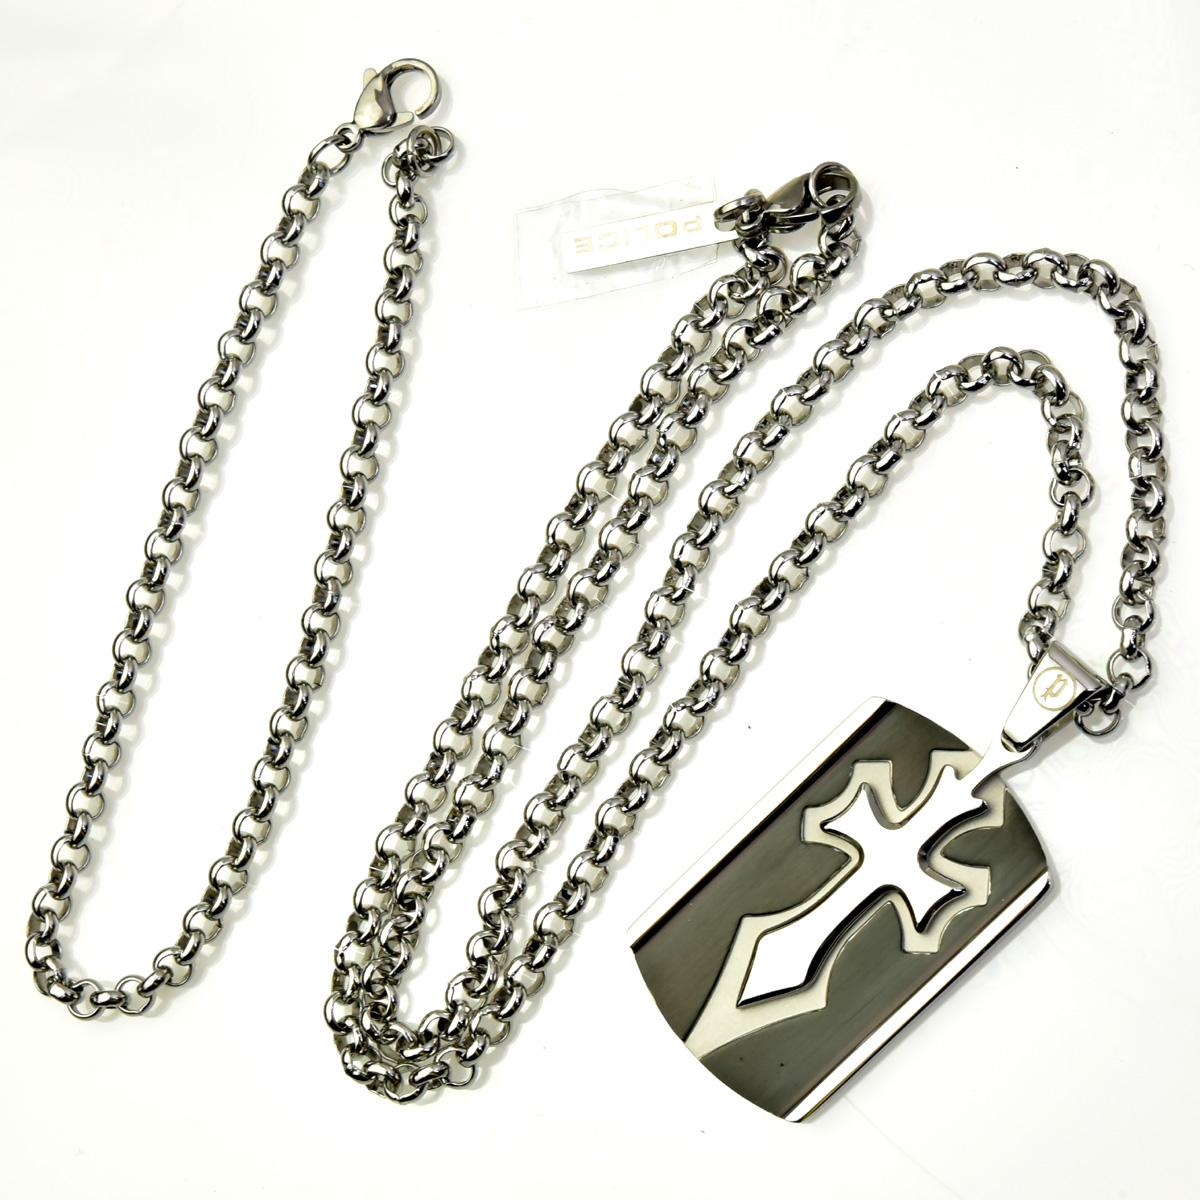 http://www.police.ne.jp/images/police-necklace-SPIRIT%20%281%29.jpg